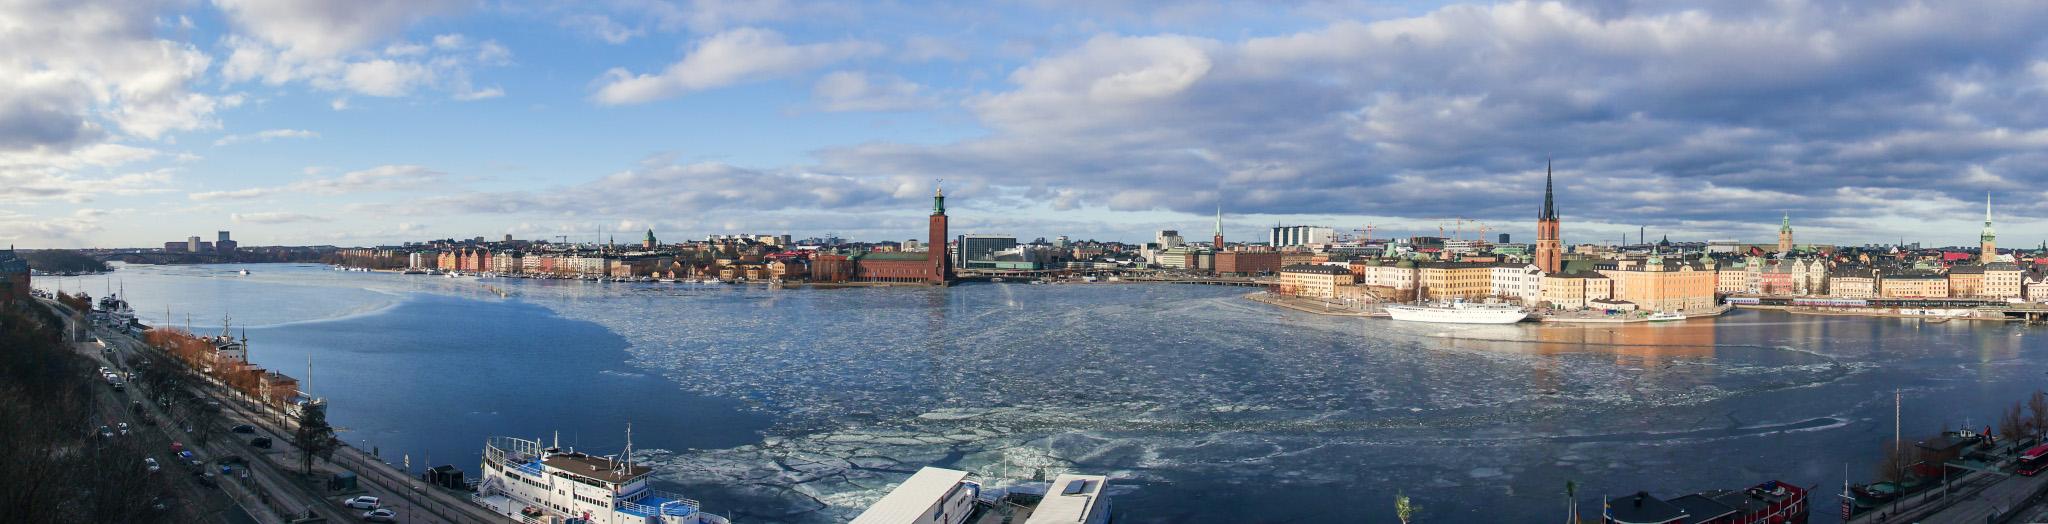 Stockholm - Panorama